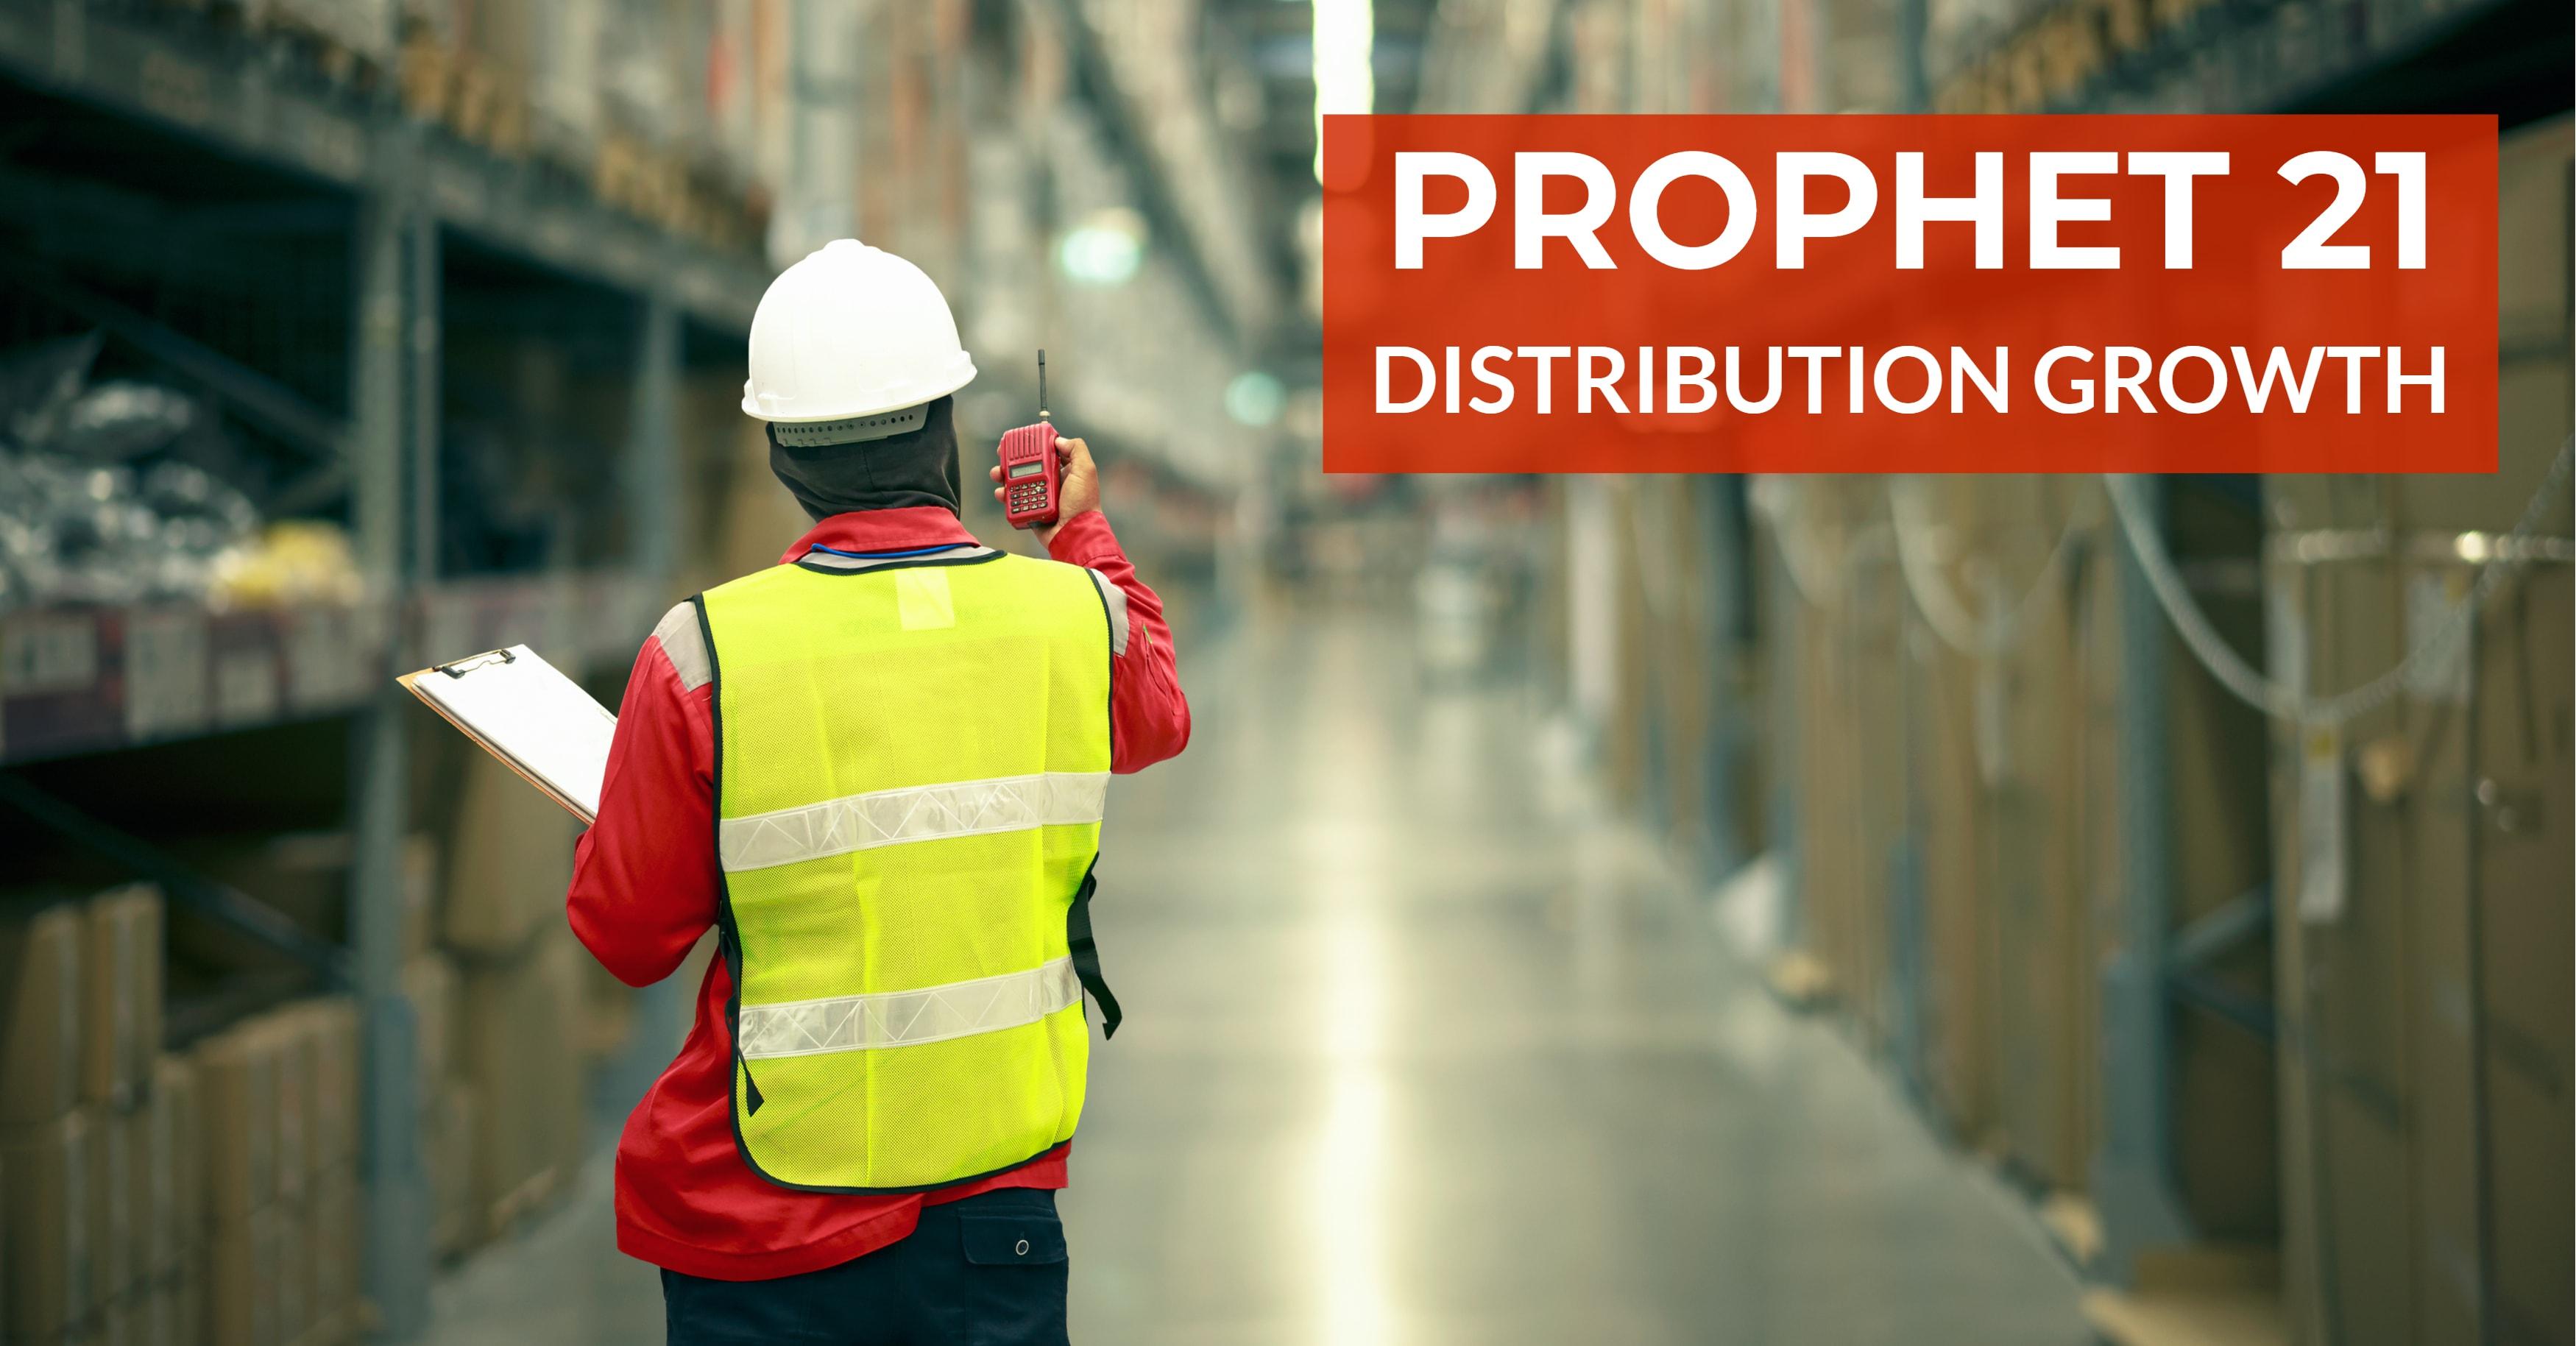 Prophet 21 Distribution Growth